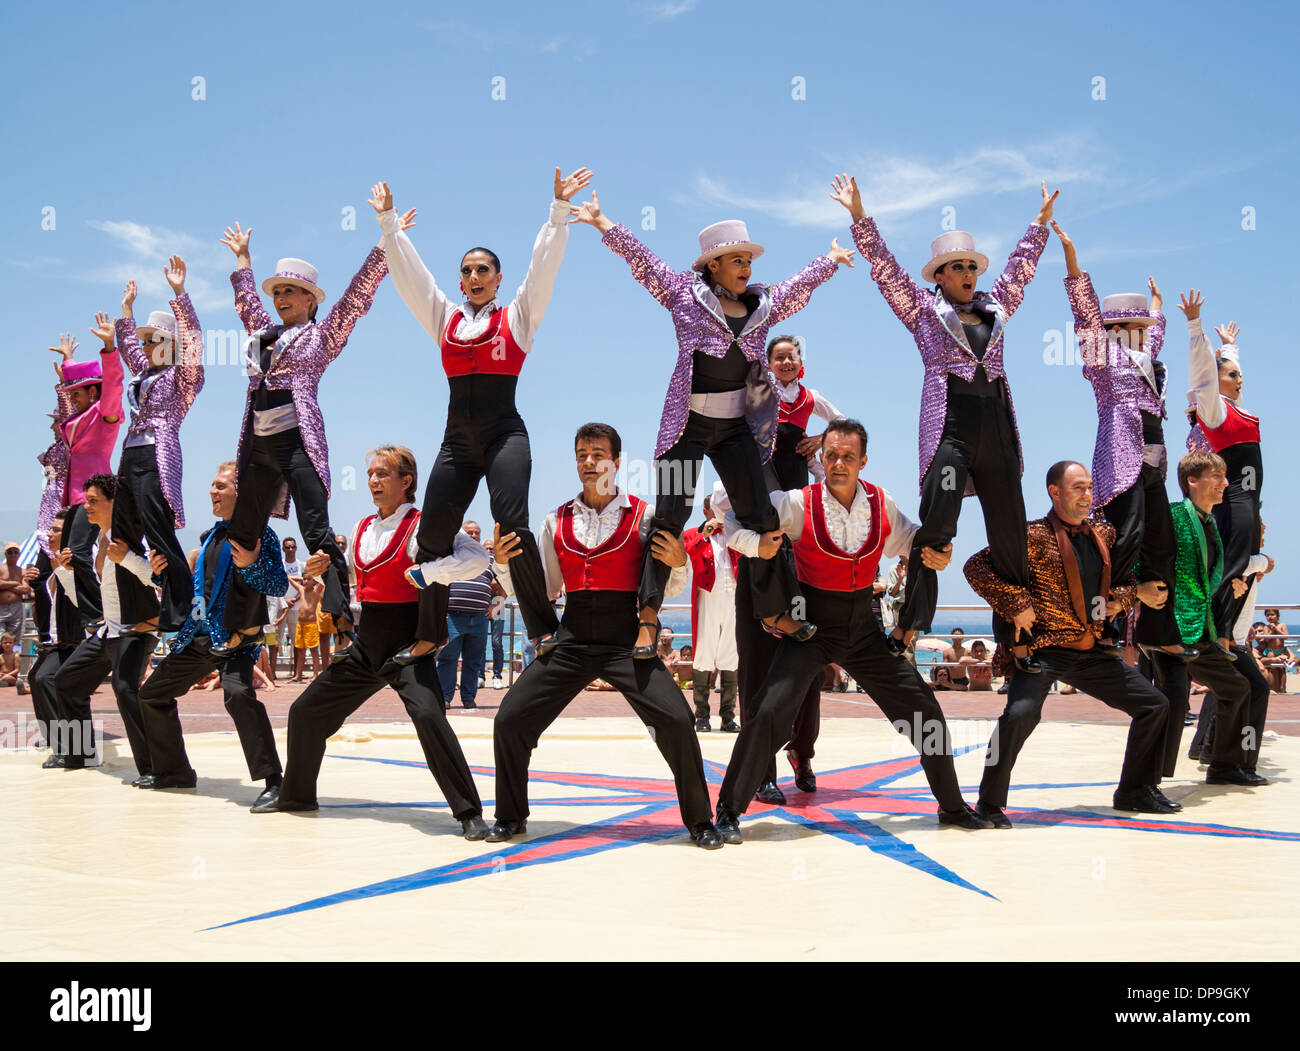 Circus performing near beach in Las Palmas, Gran Canaria, Spain Stock Photo